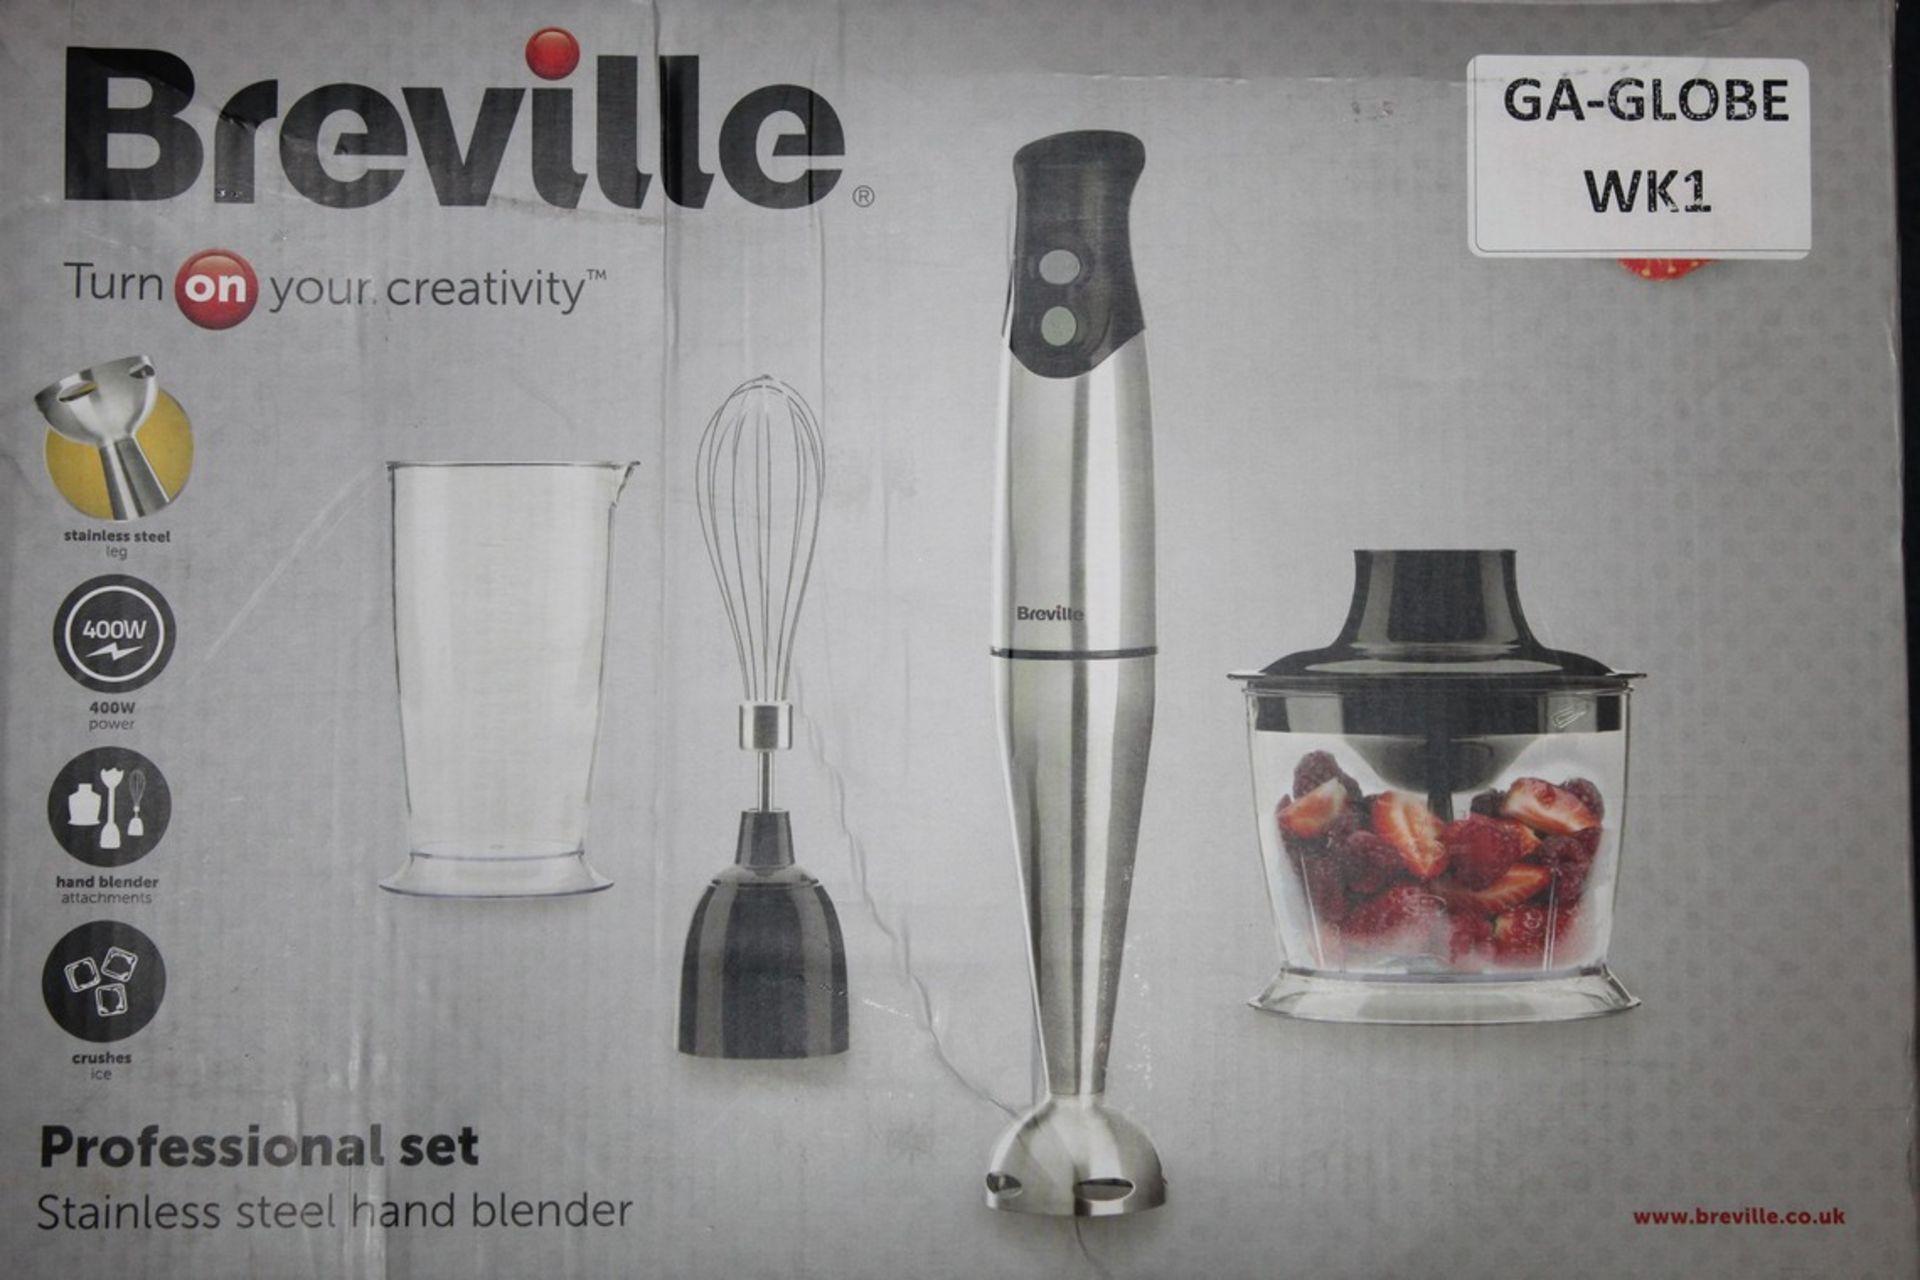 Lot 739 - Breville Professional Set, Hand Blender, RRP£40.00 (Customer-Return-Not-Tested) (Public Viewing